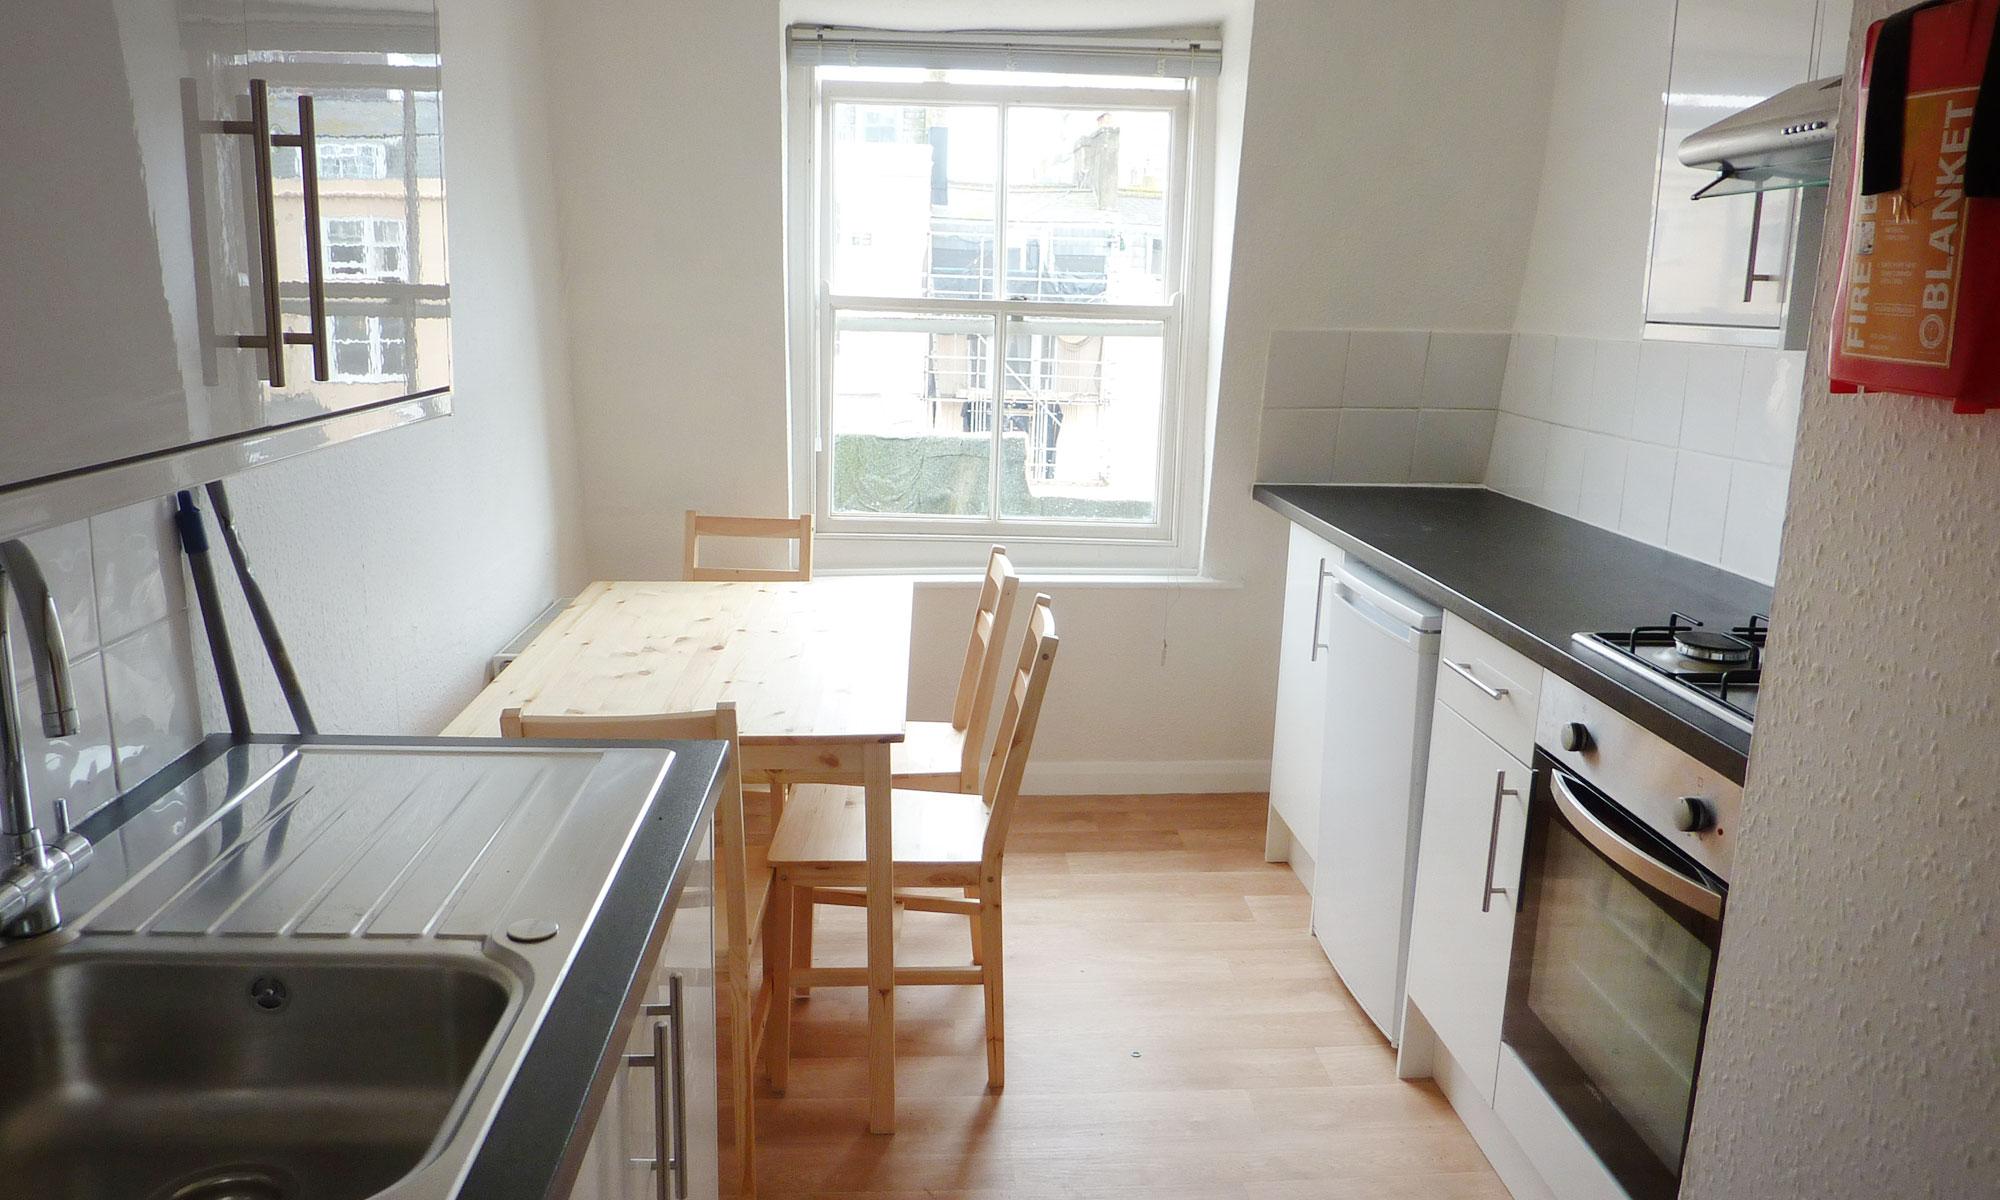 Bedford-square-kitchen